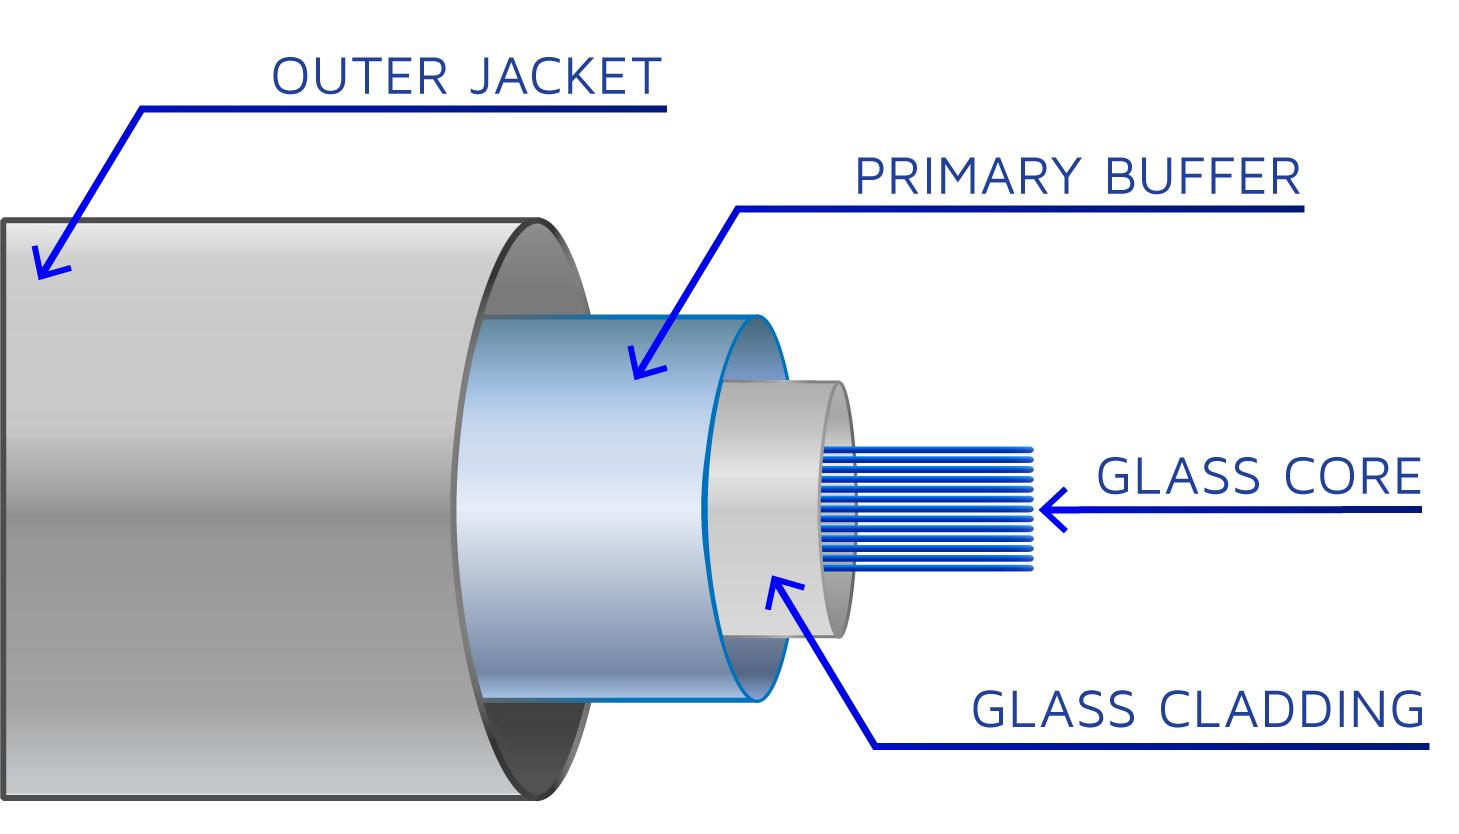 Fiber-optic-cable-anatomy-diagram-01